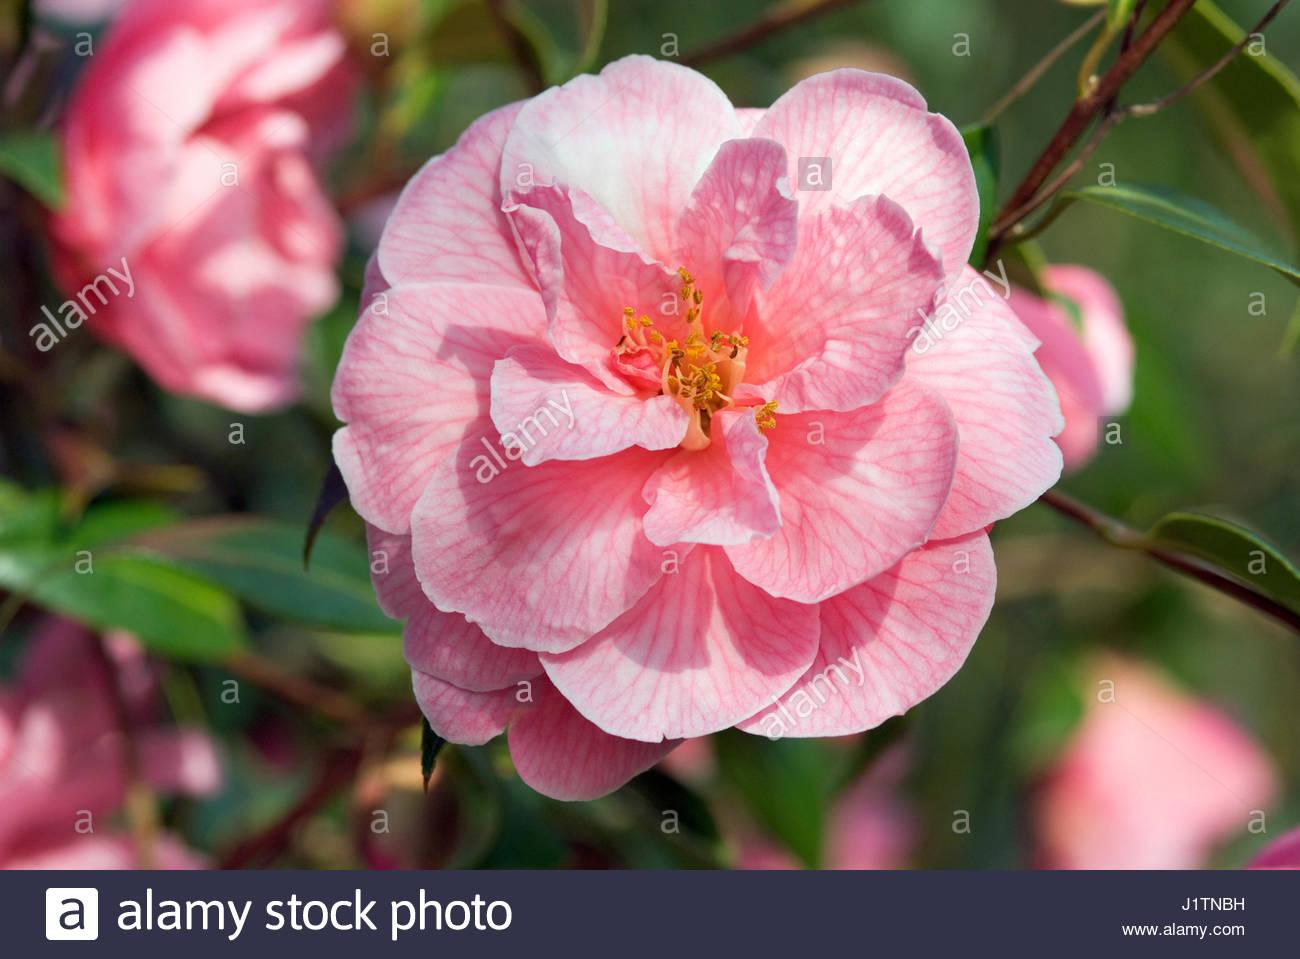 Camellia donation stock photos camellia donation stock - Camelia fotos ...